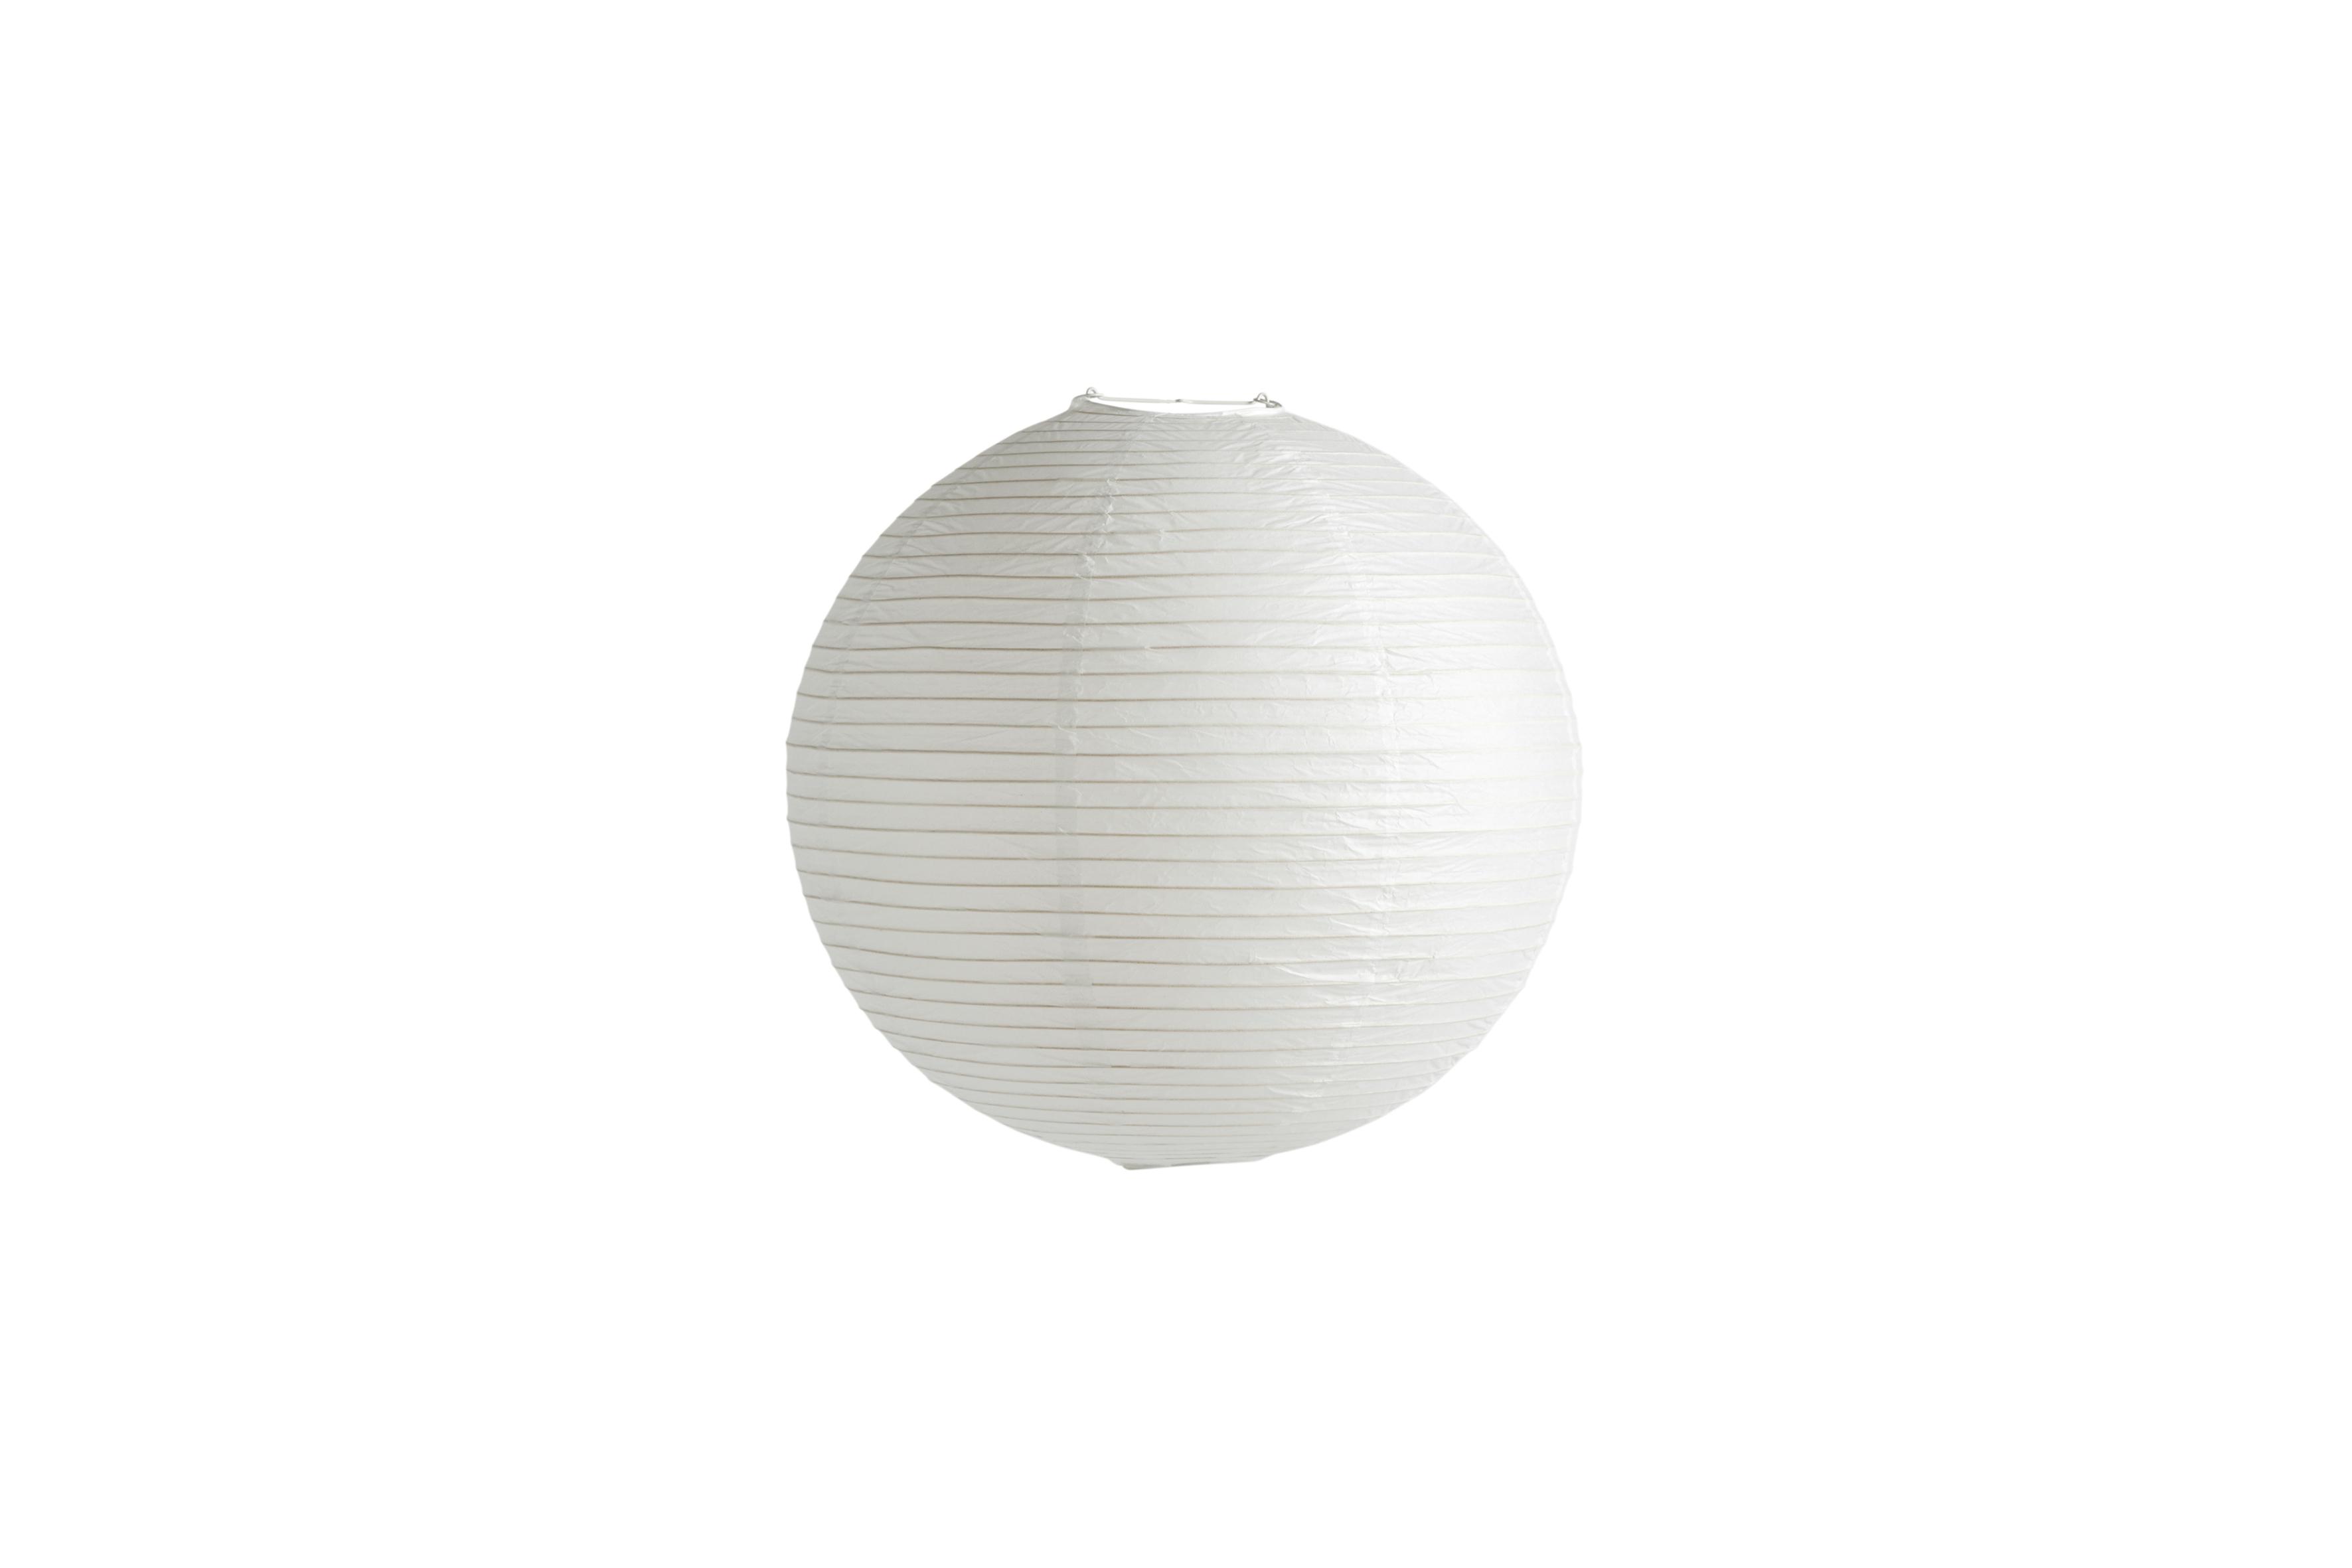 HAY Classic rispapir lampeskærm, Ø50 cm, hvid